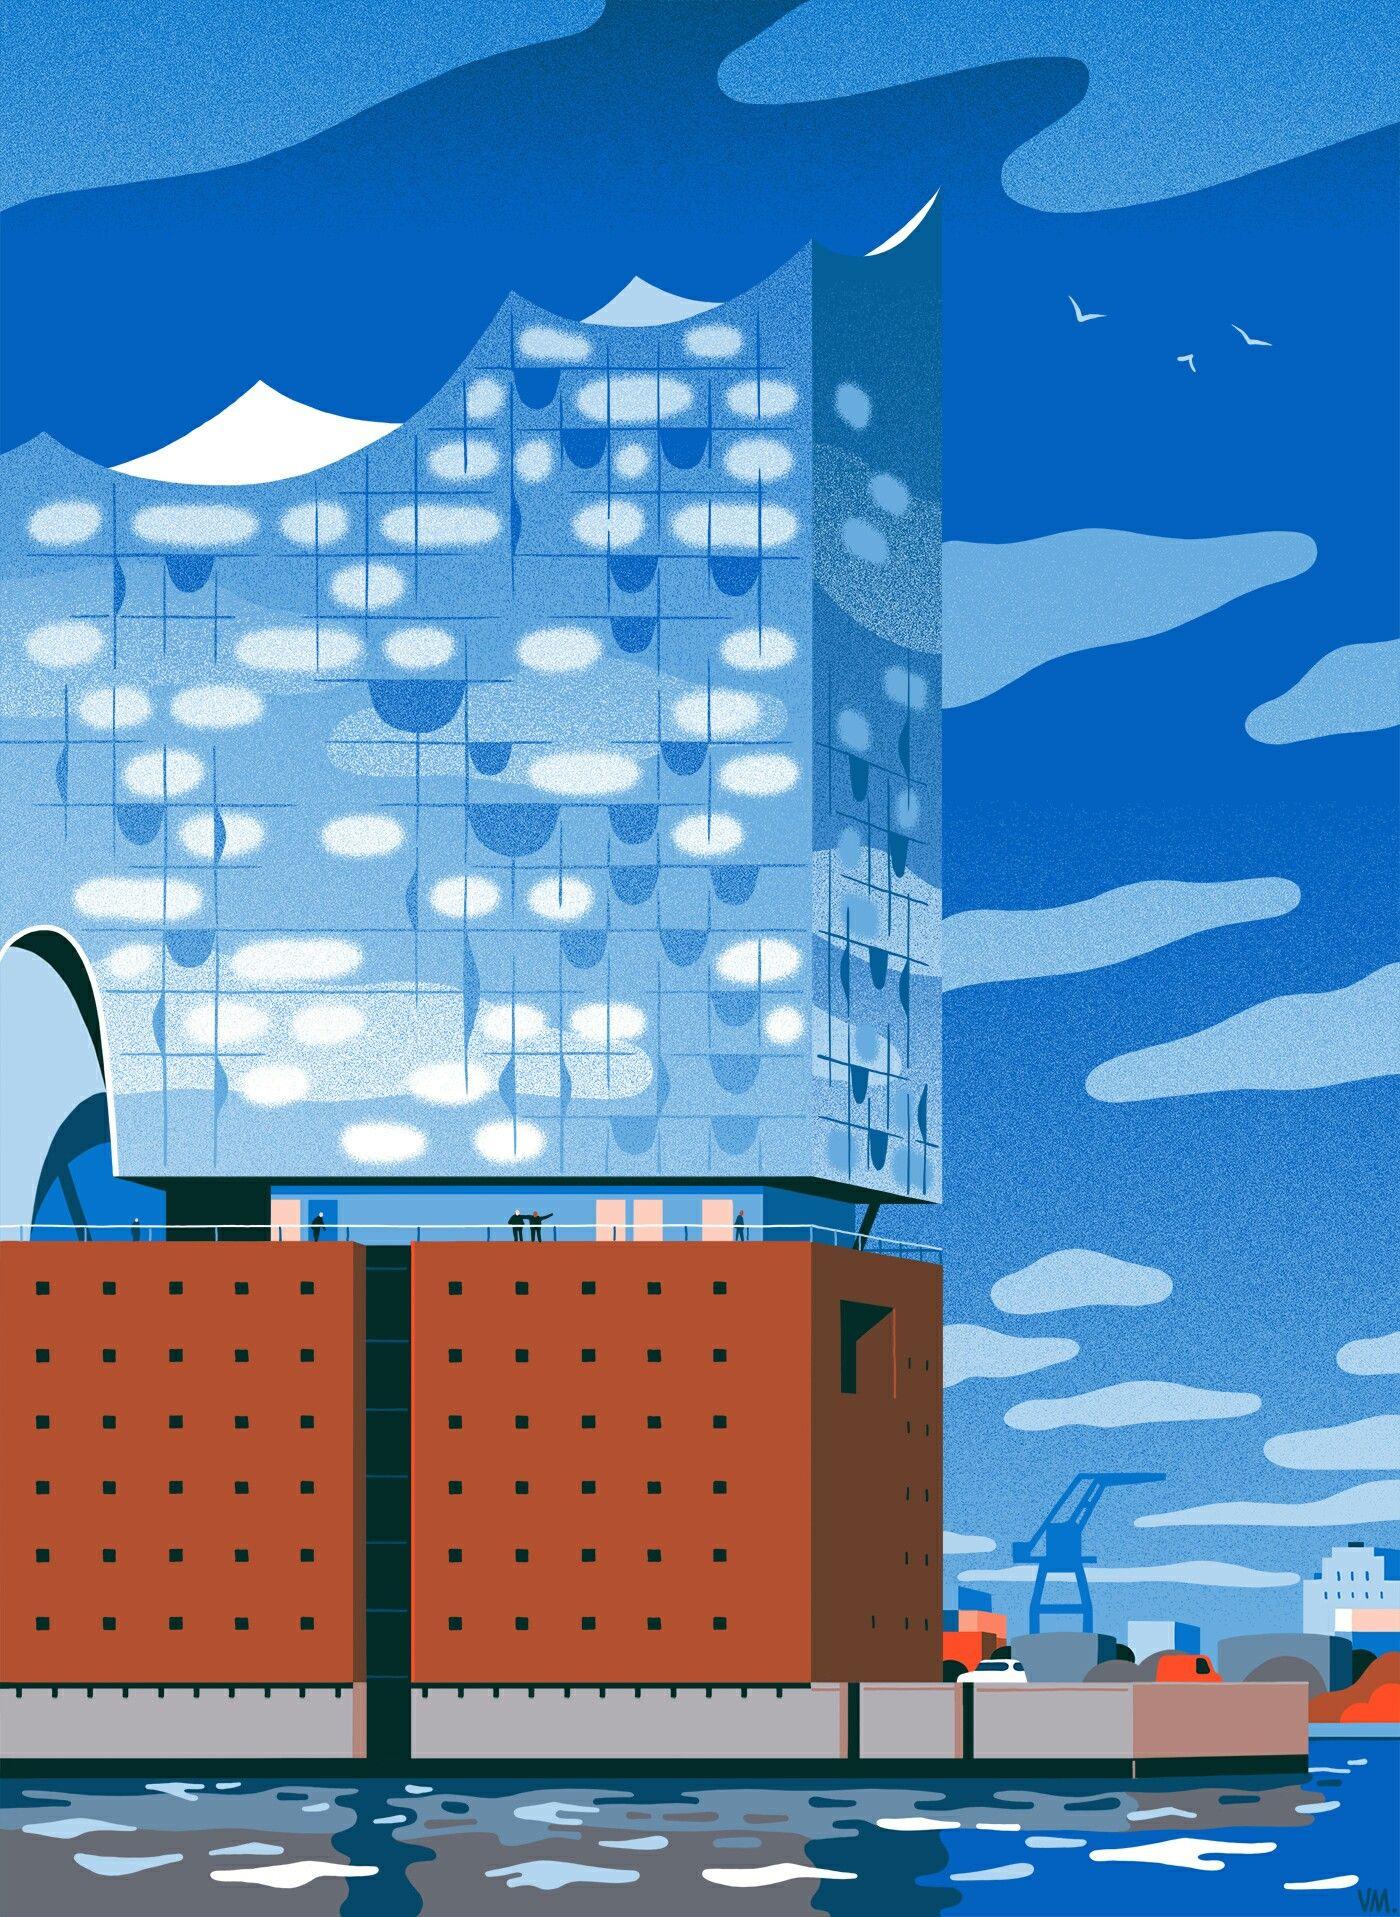 vincent mahe the new yorker city illustration germany landscape